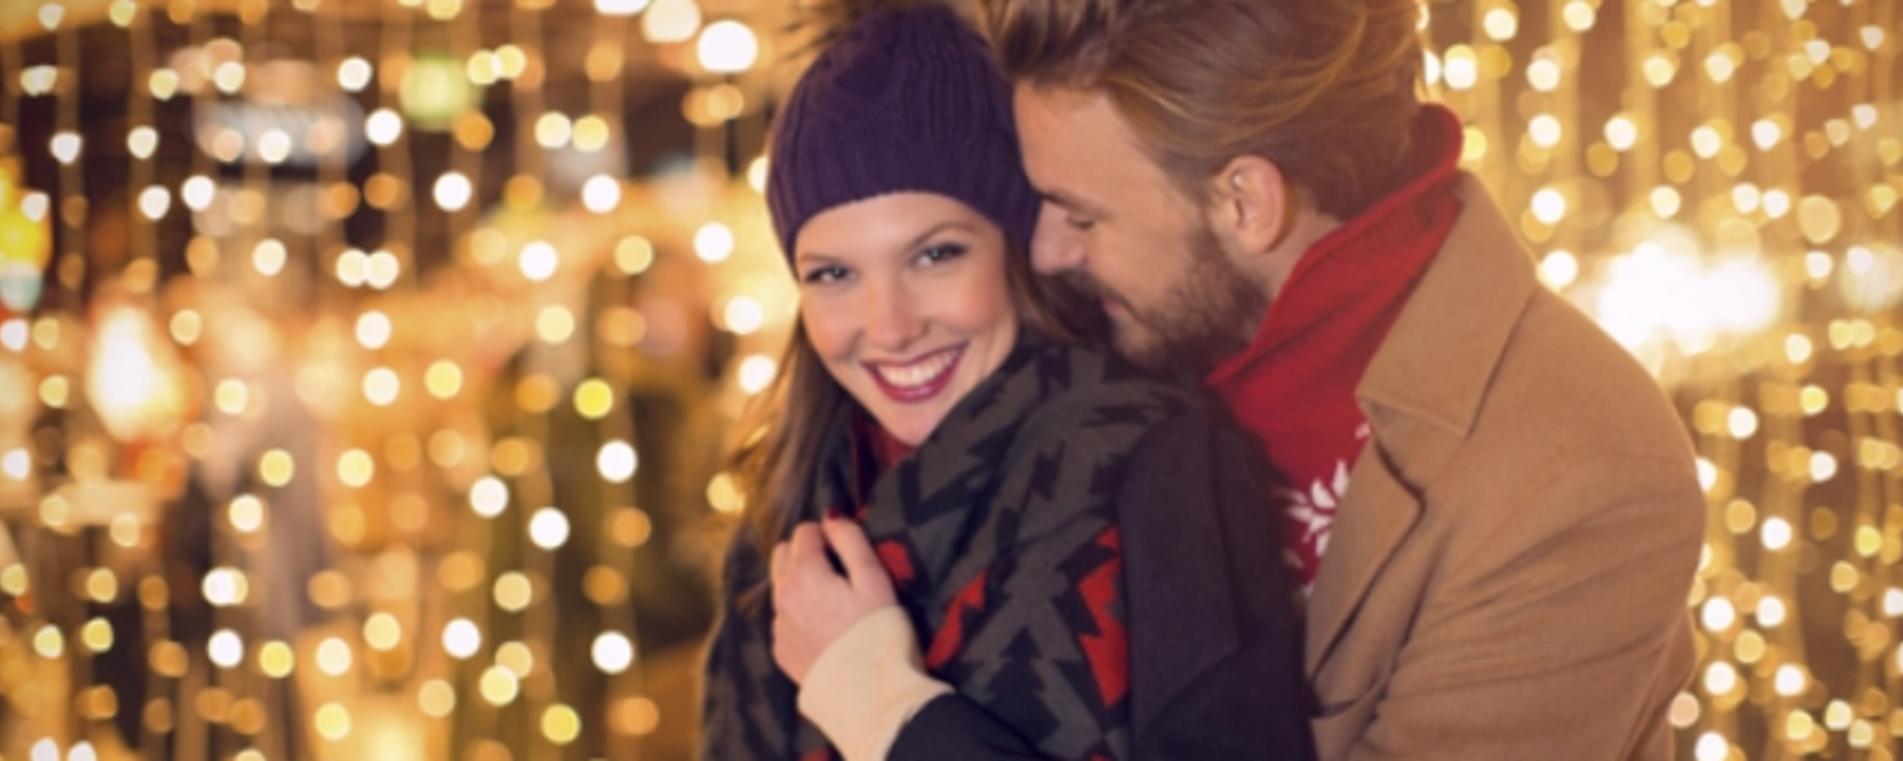 Dating σε απευθείας σύνδεση λευκό παιδιά